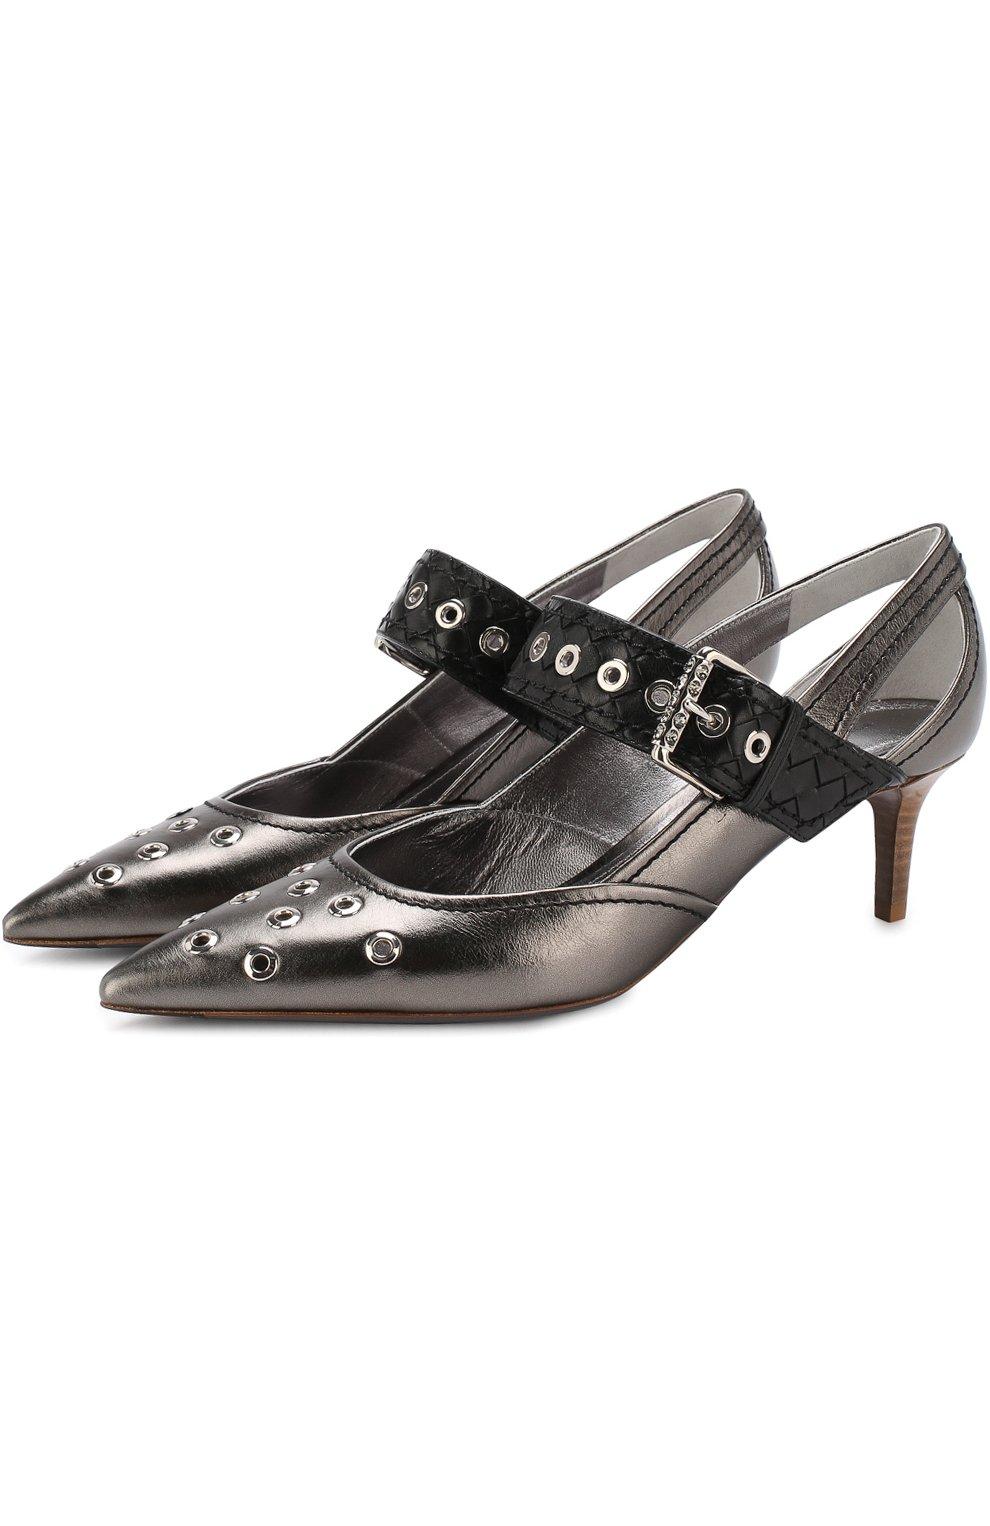 Женские туфли из металлизированной кожи на каблуке kitten heel BOTTEGA VENETA серебряного цвета, арт. 512136/VAVG6 | Фото 1